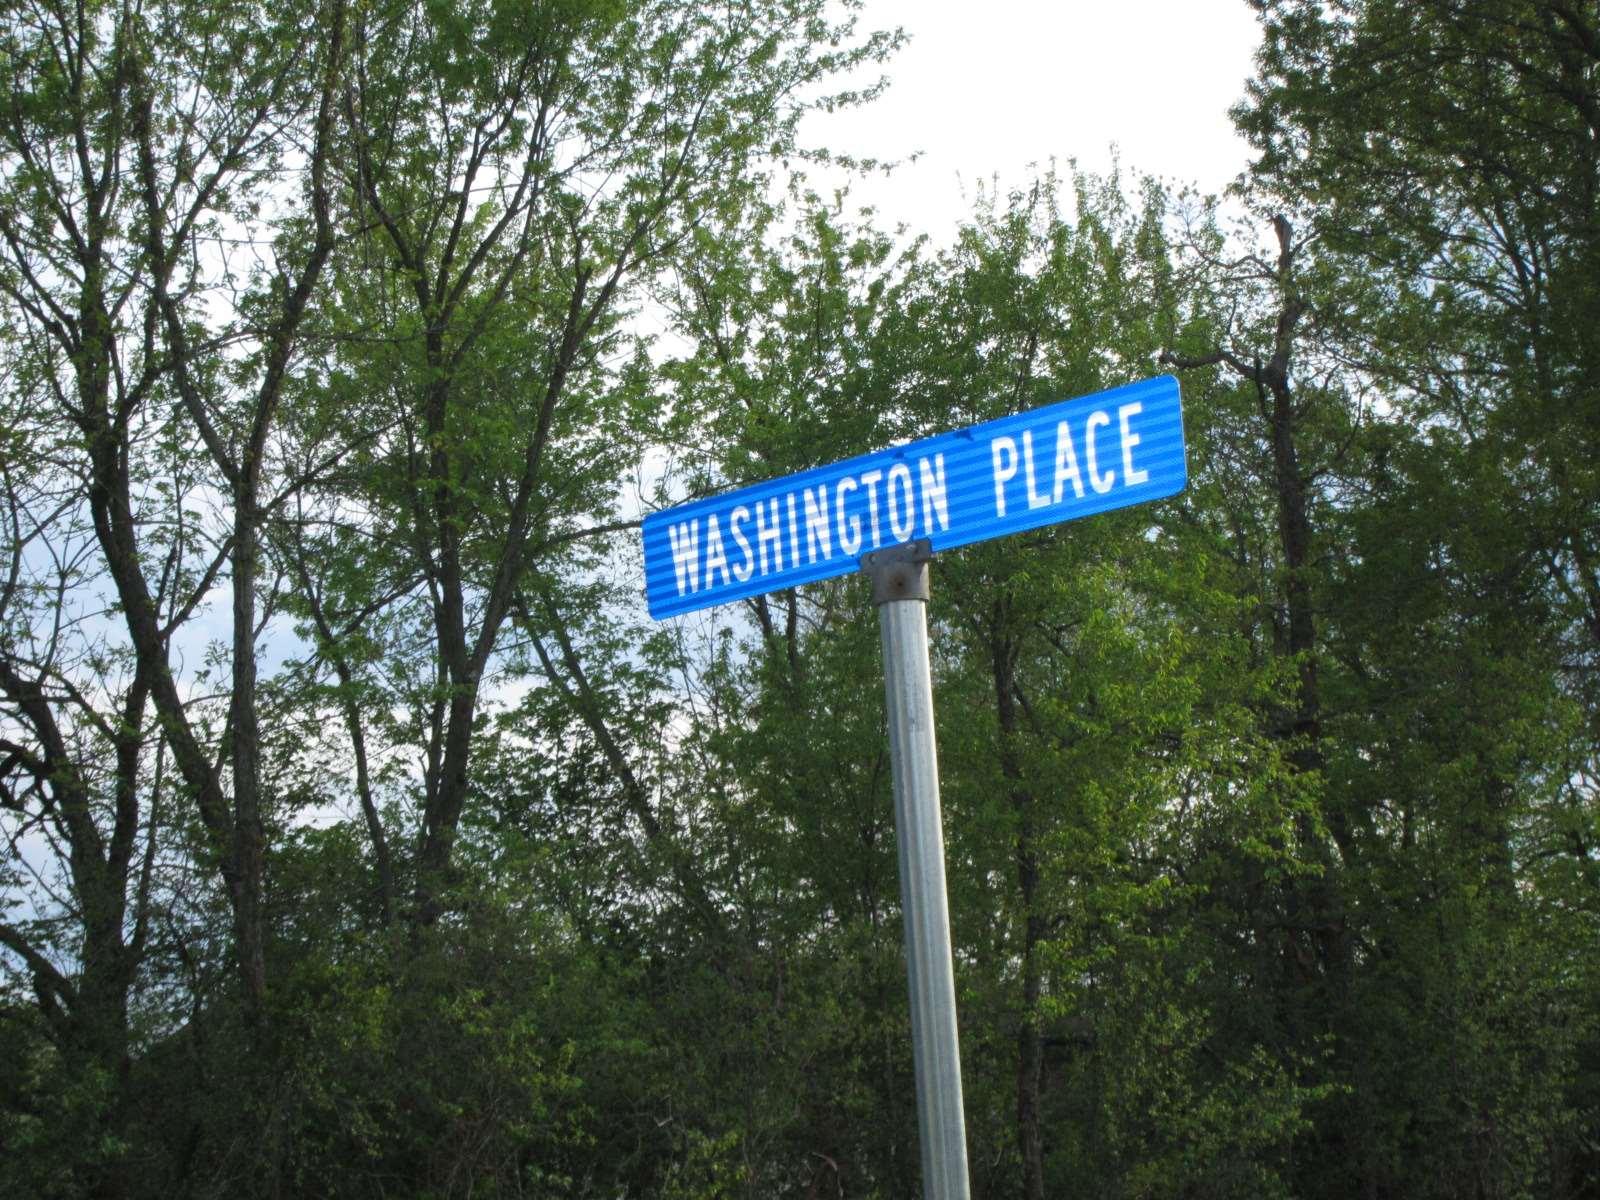 205 WASHINGTON Property Photo - Riverton, IL real estate listing